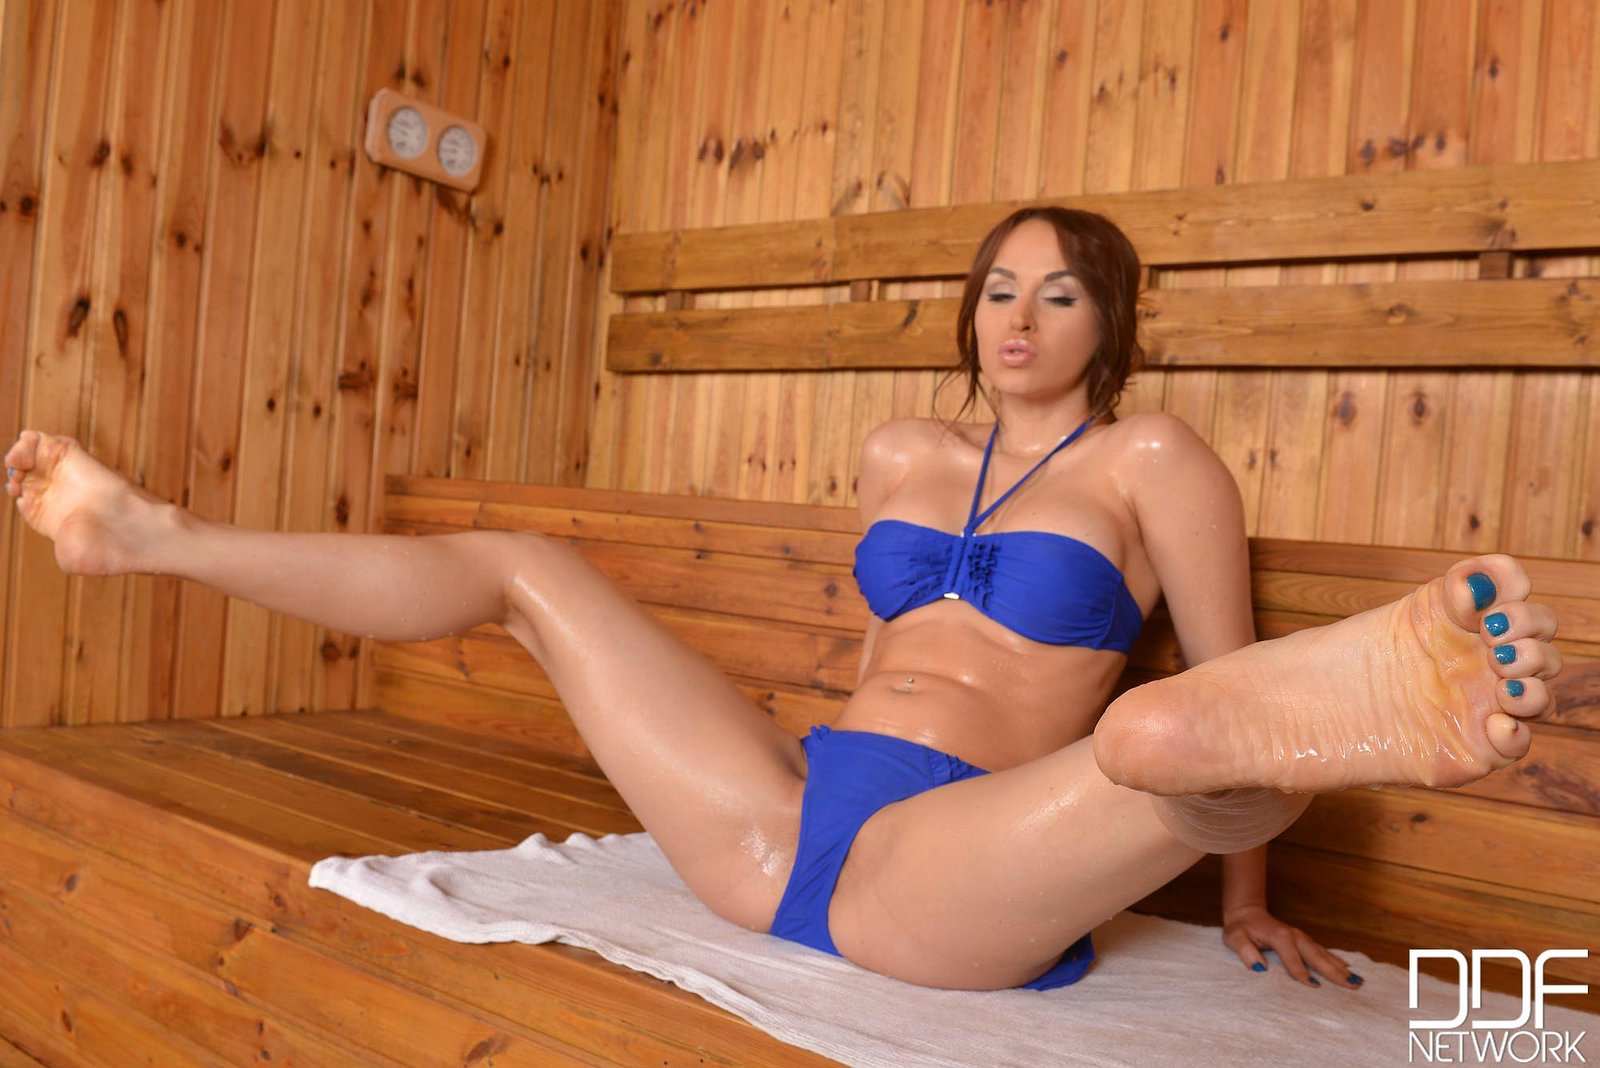 Aleska Diamond Feet - Aleska Diamond showing off her sexy legs and feet in the ...